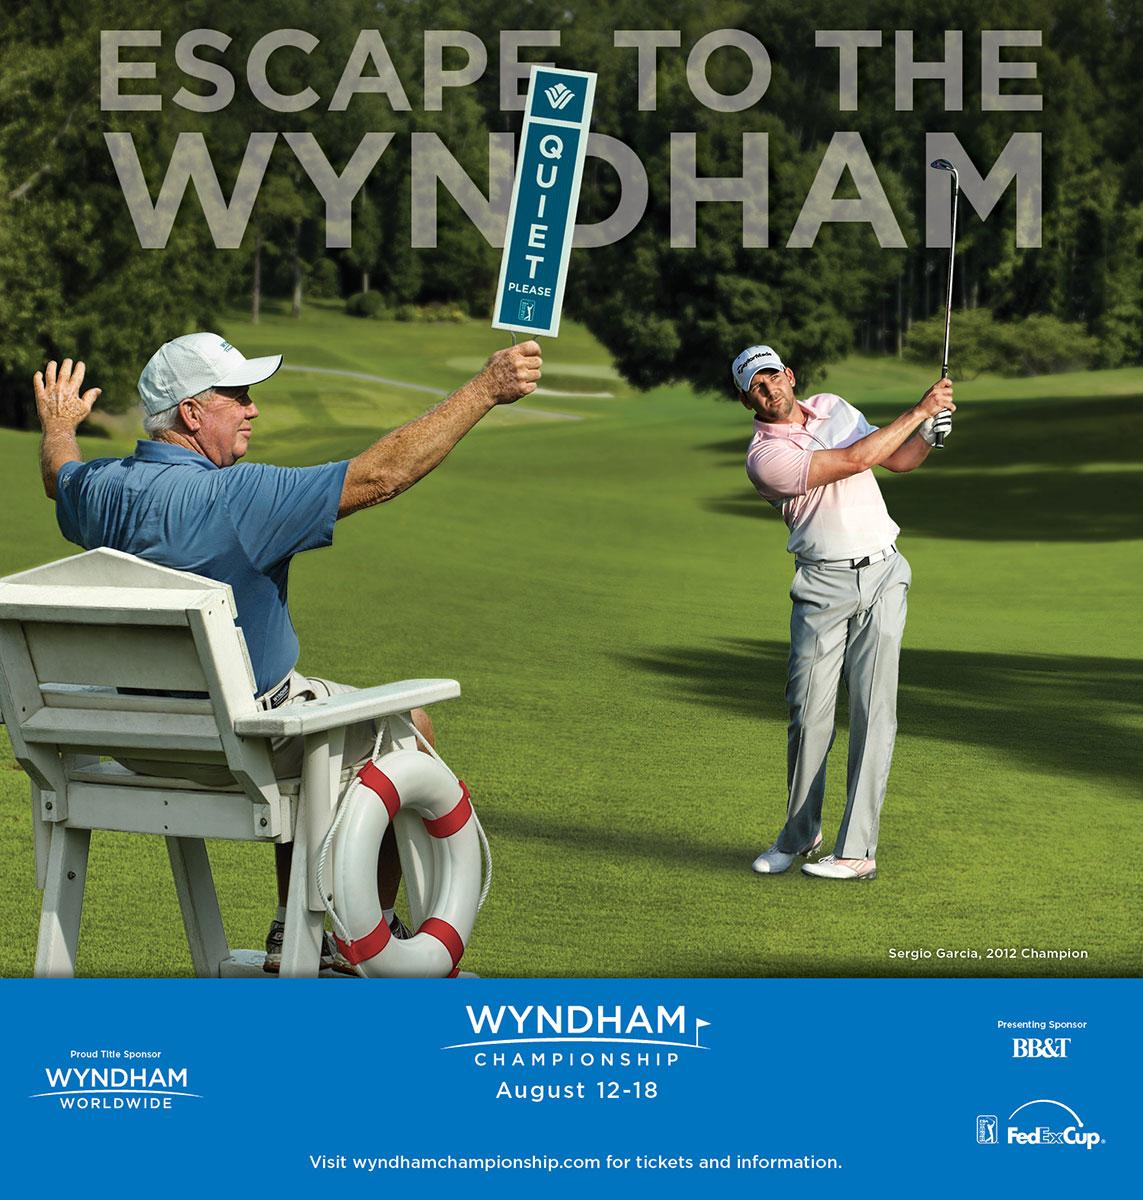 Wyndham Championship - 2013 Escape to the Wyndham ad